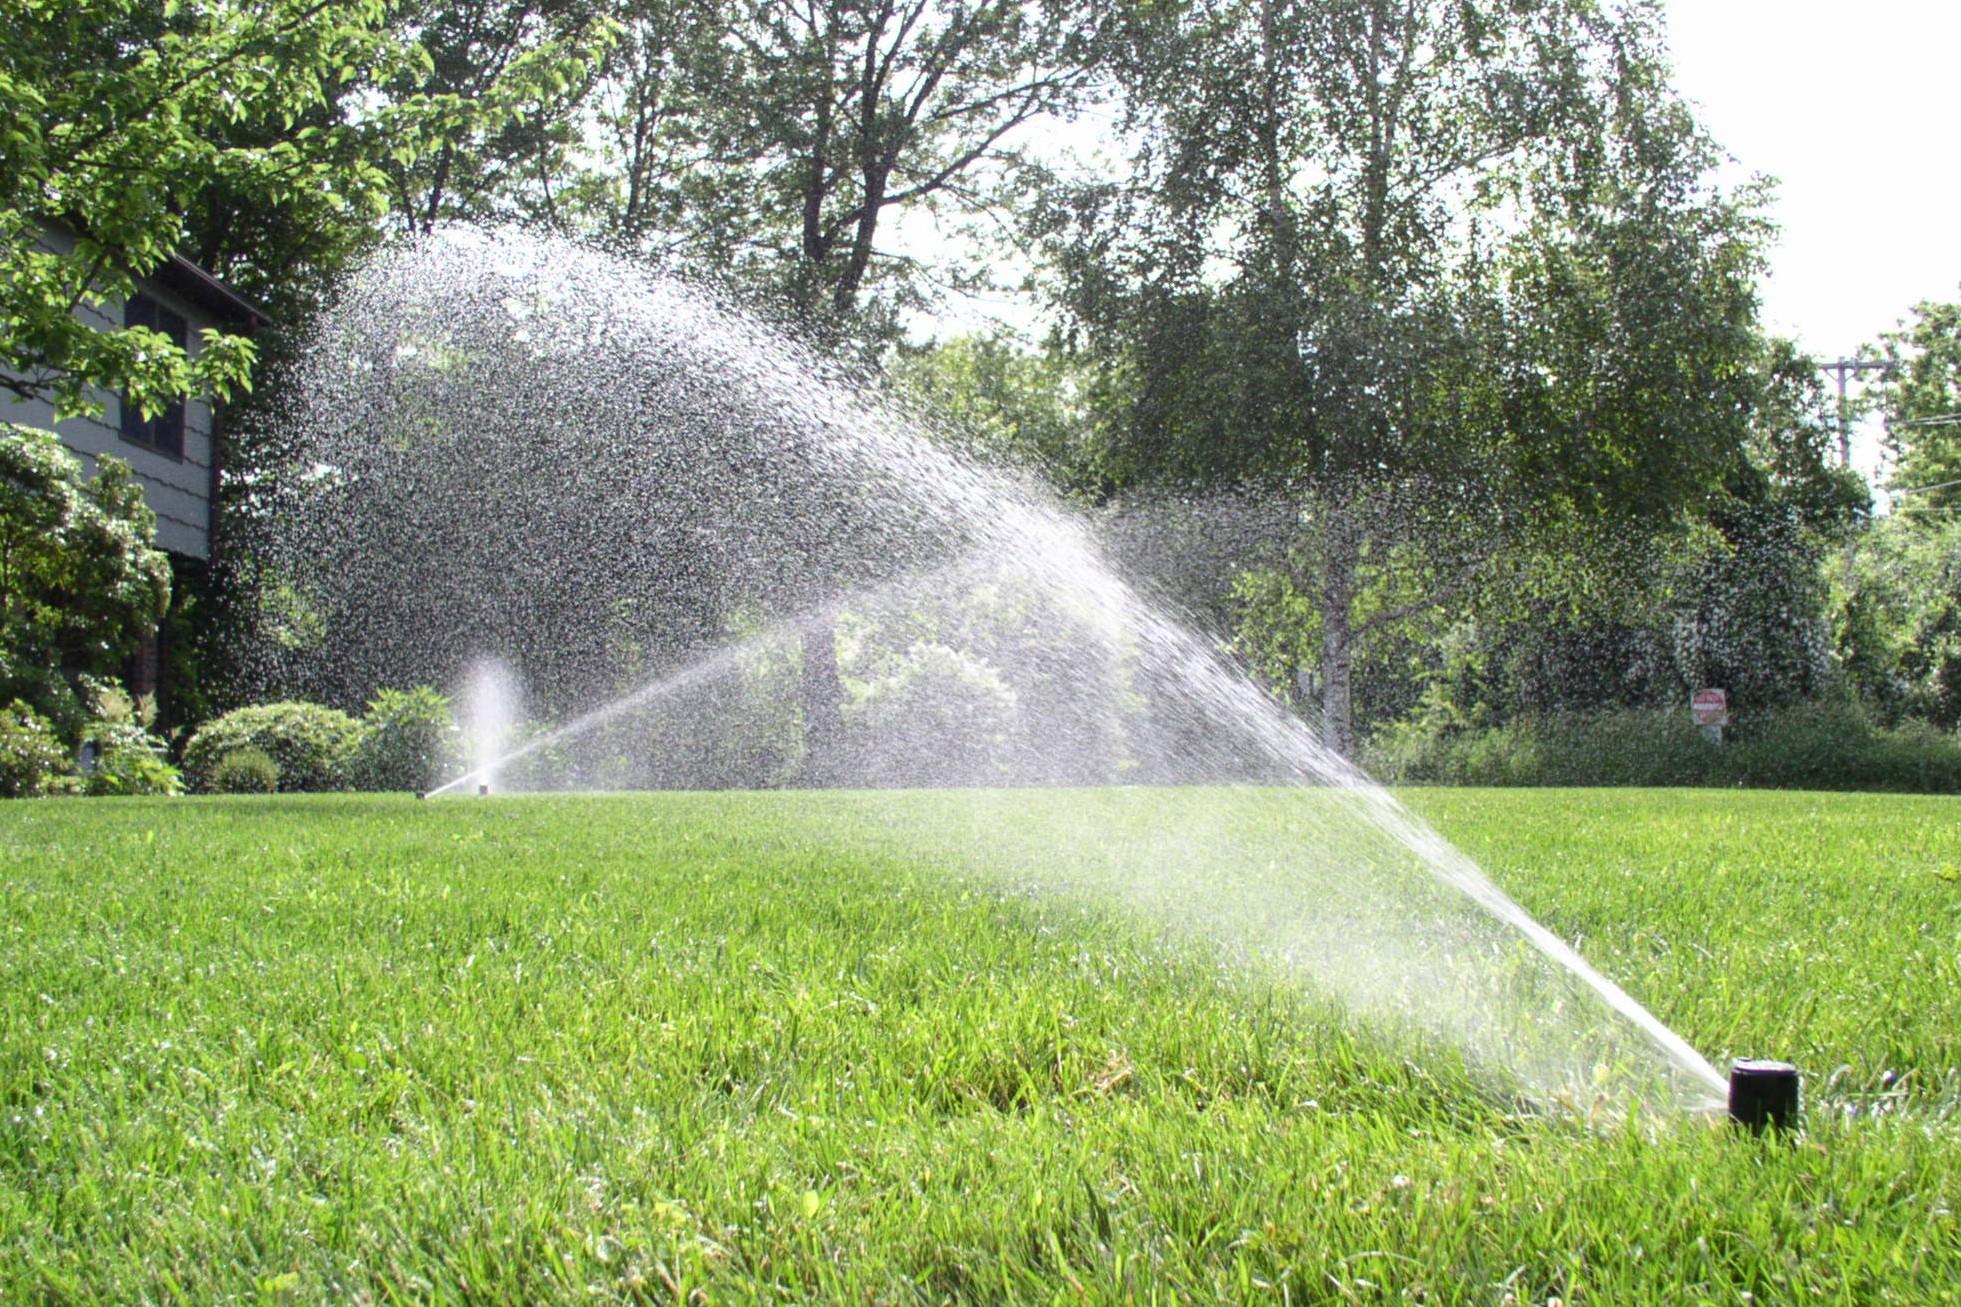 New Sprinkler Systems Install DIY Lawn Sprinkler System Kits